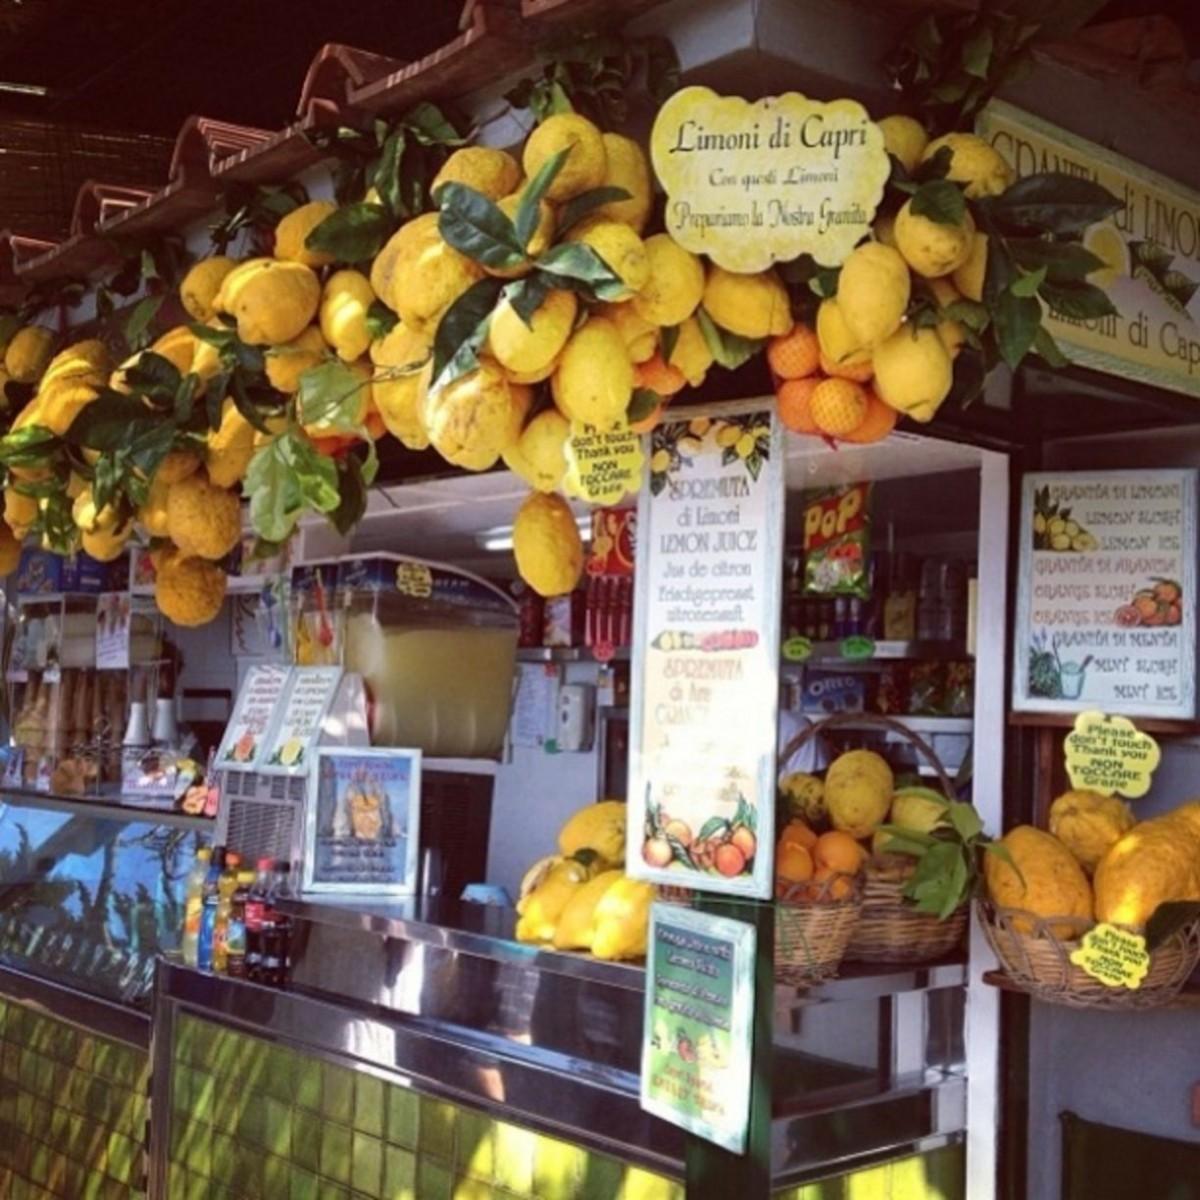 The lemon scented summer - between Amalfi and Capri